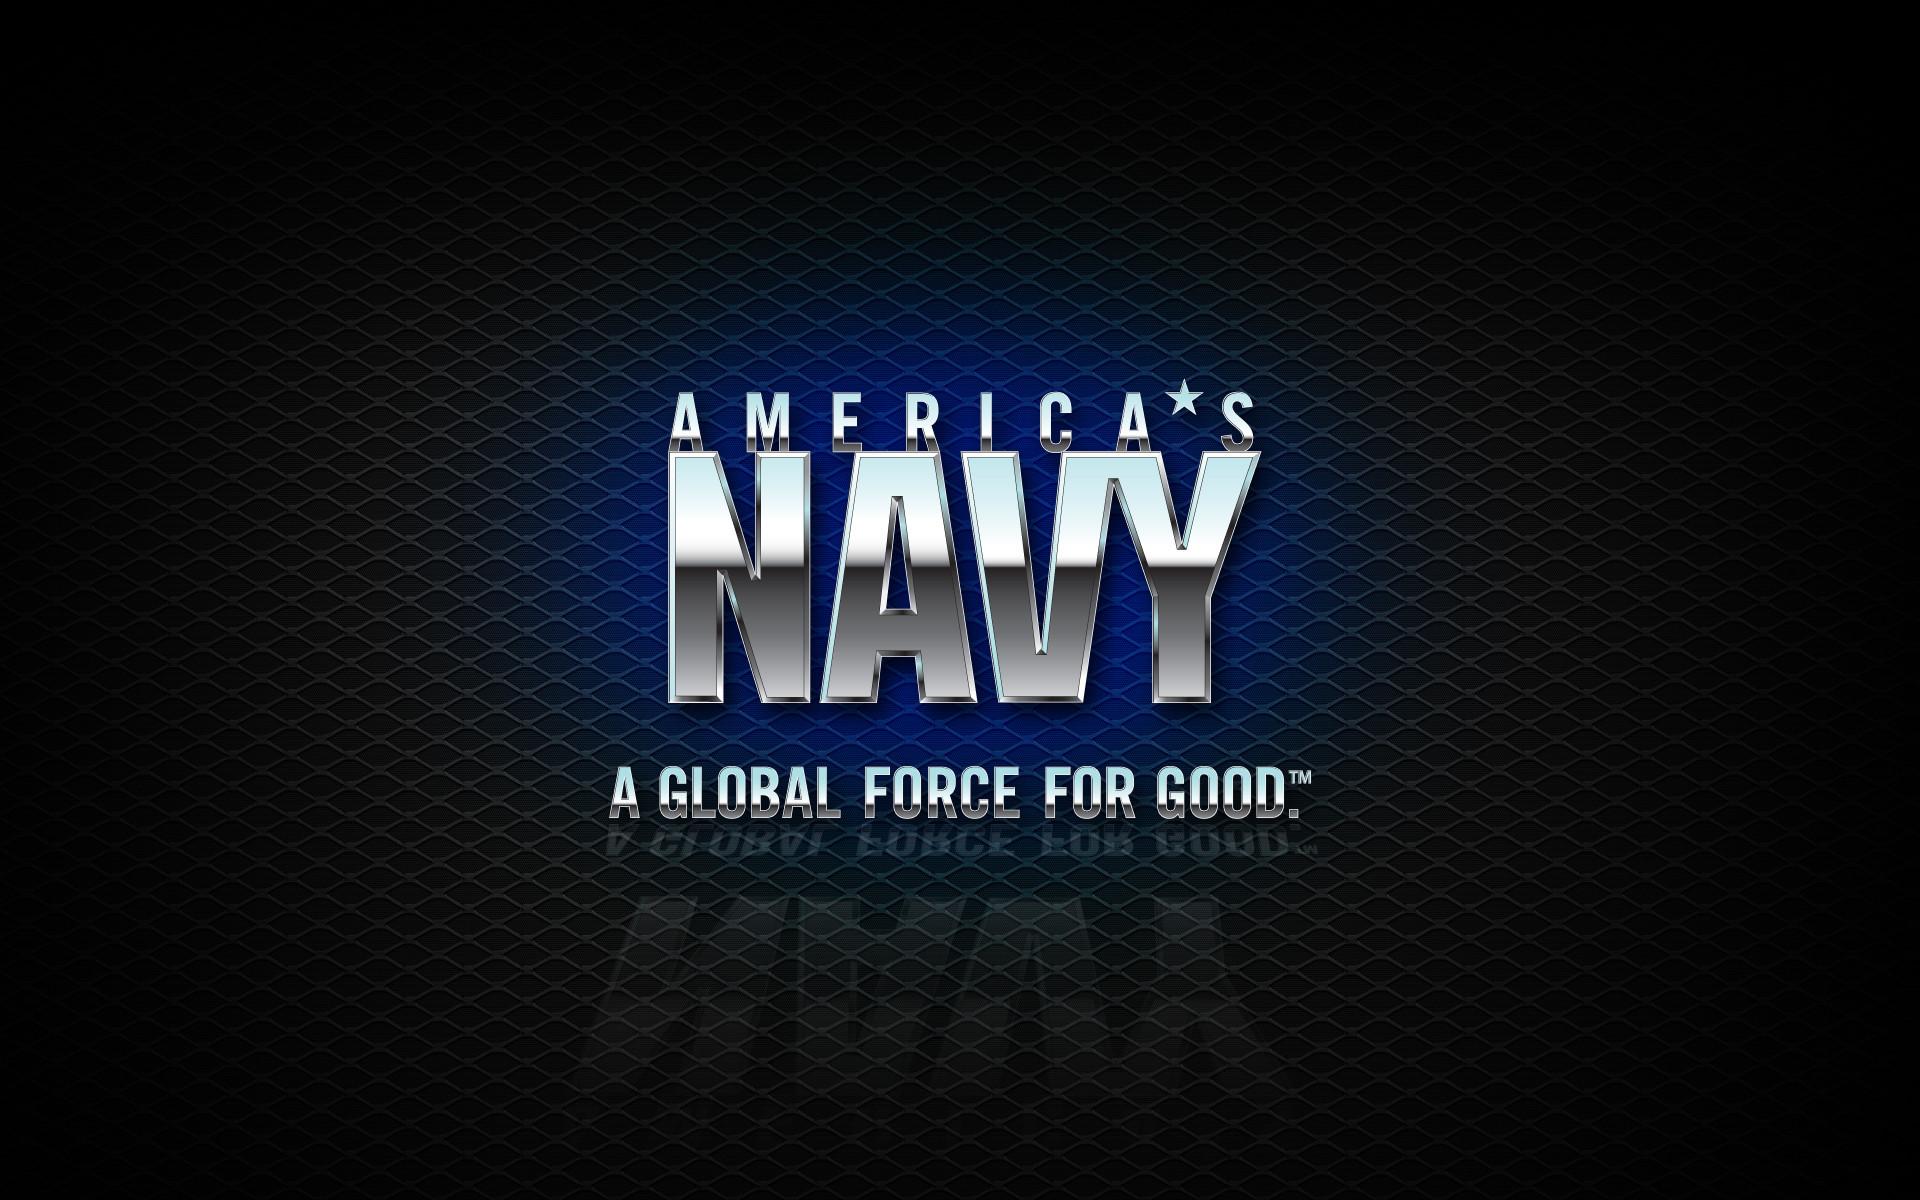 US Navy Images Logo Wallpaper 1920x1200